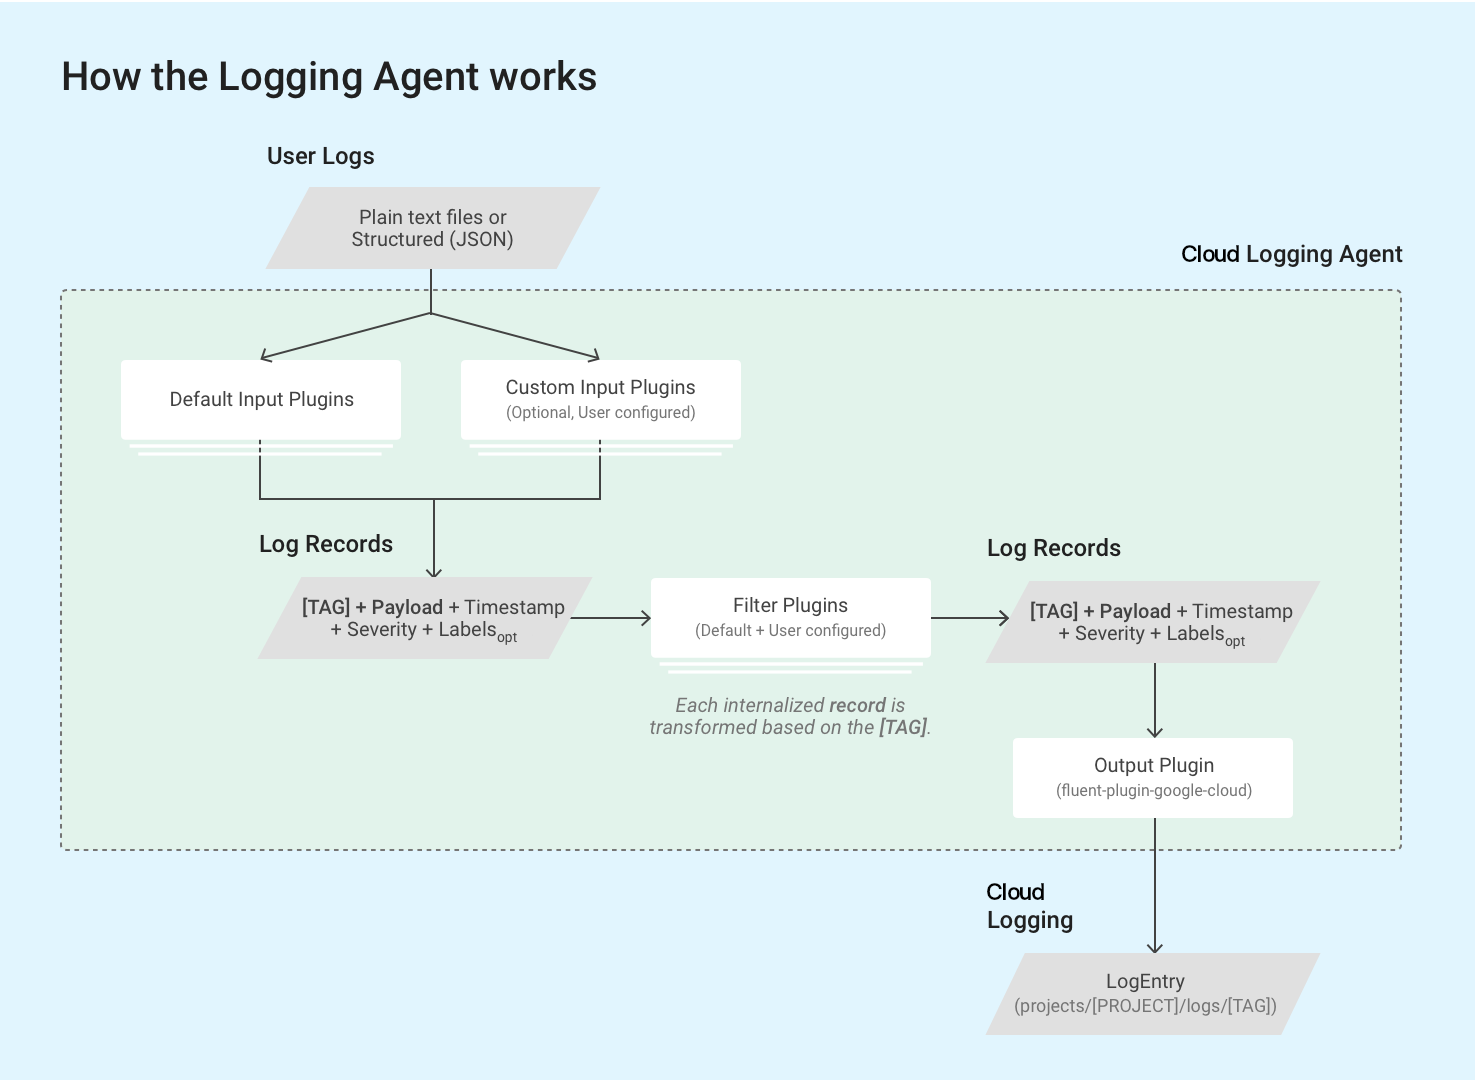 Logging 代理的工作原理